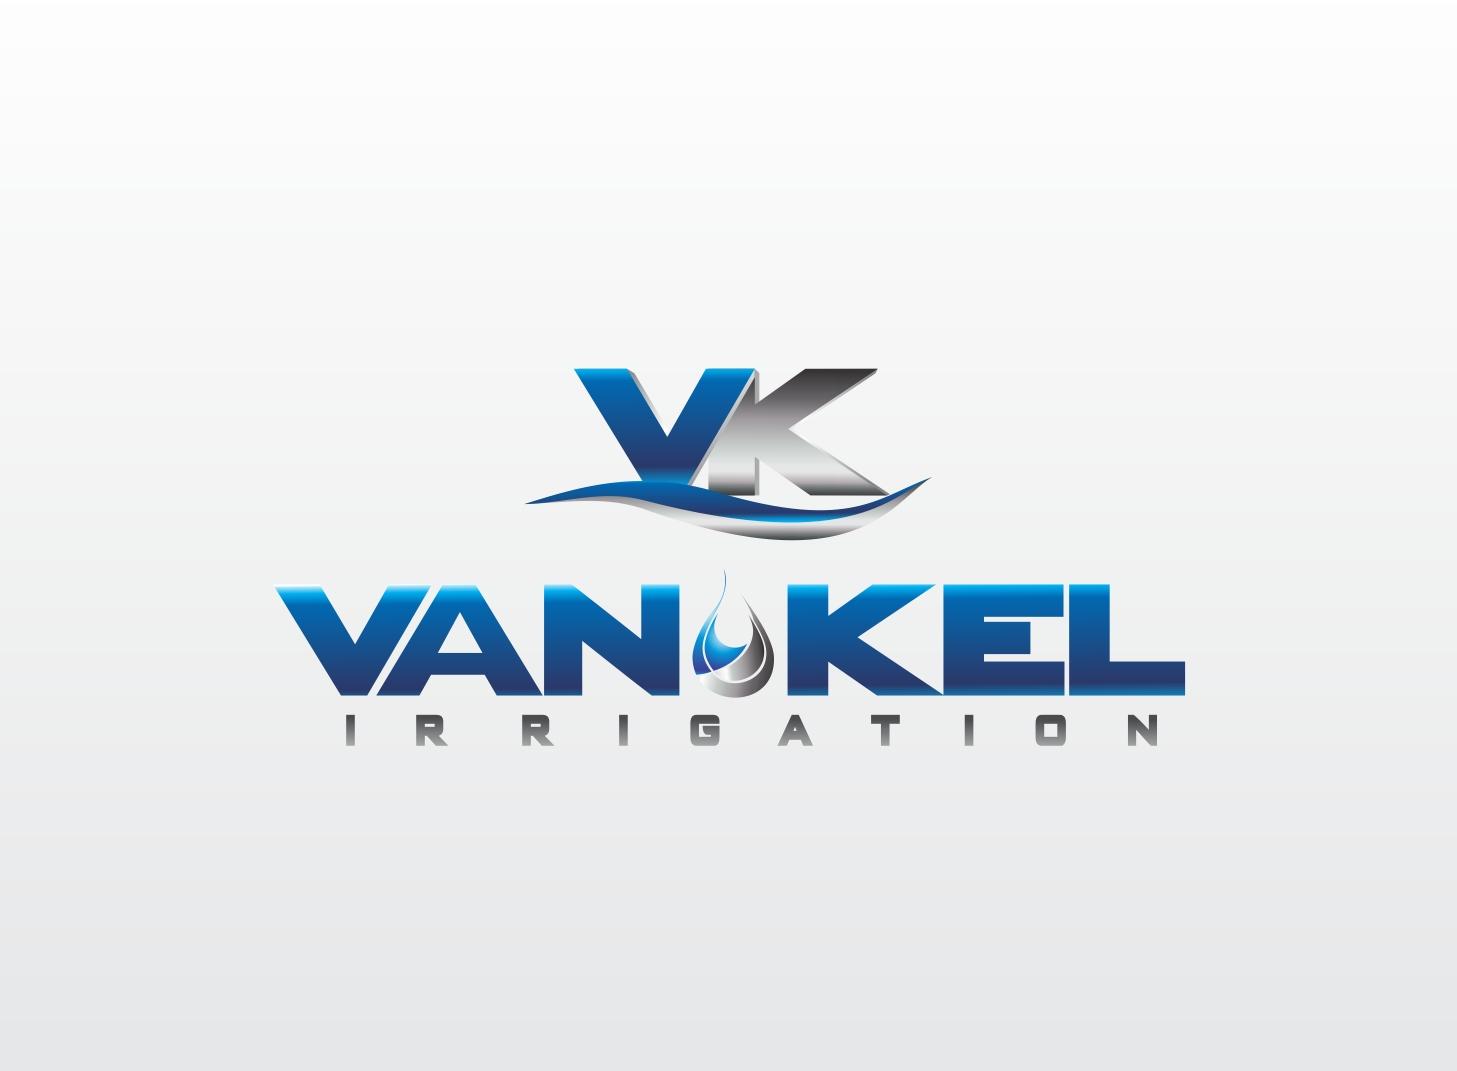 Logo Design by Zdravko Krulj - Entry No. 204 in the Logo Design Contest Van-Kel Irrigation Logo Design.